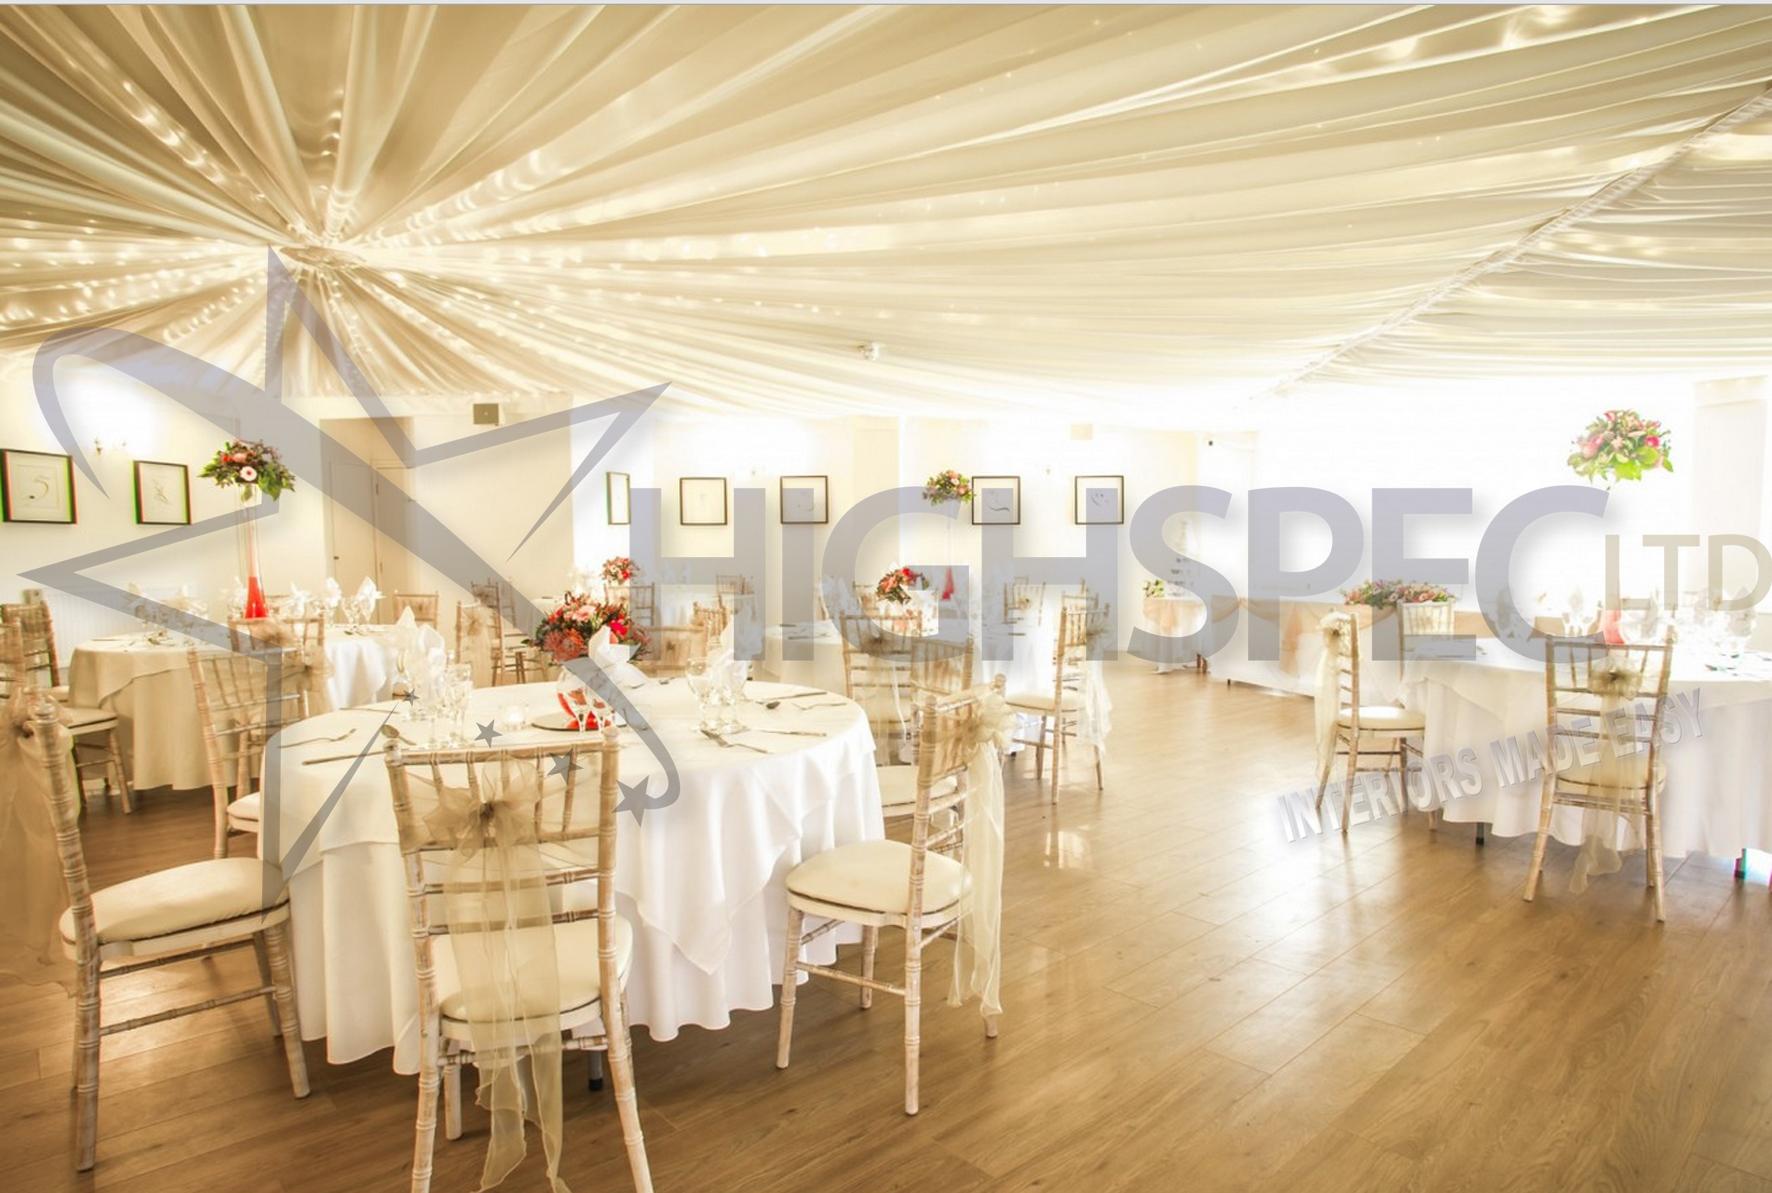 Venue draping - Fairylight ceiling drape